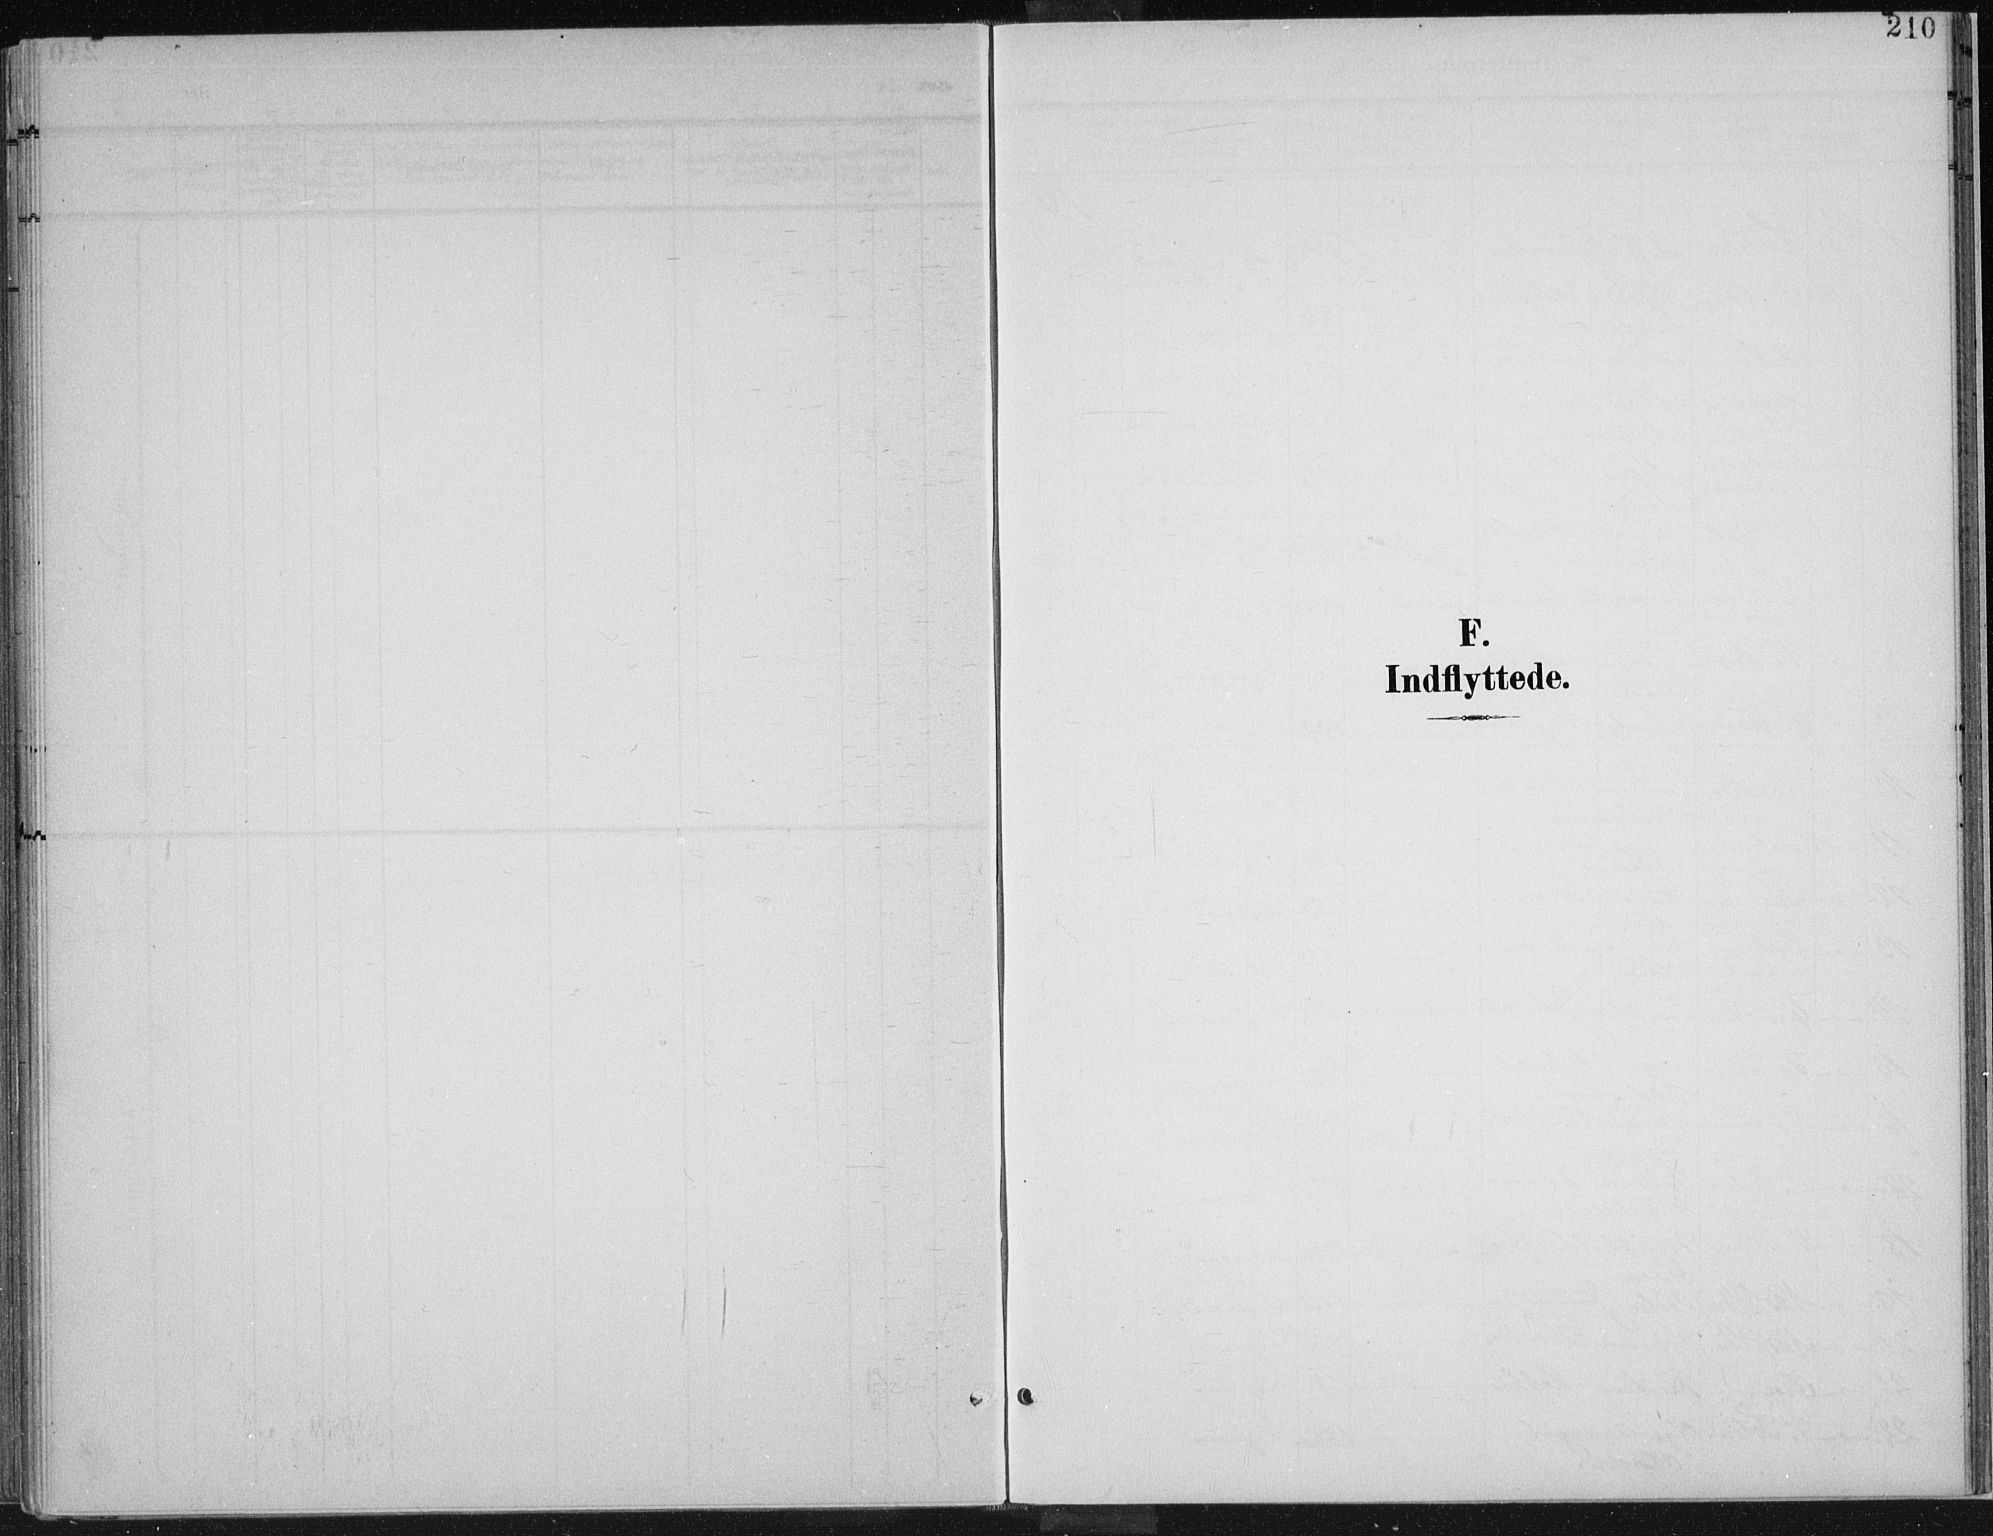 SAH, Vardal prestekontor, H/Ha/Haa/L0013: Ministerialbok nr. 13, 1901-1911, s. 210